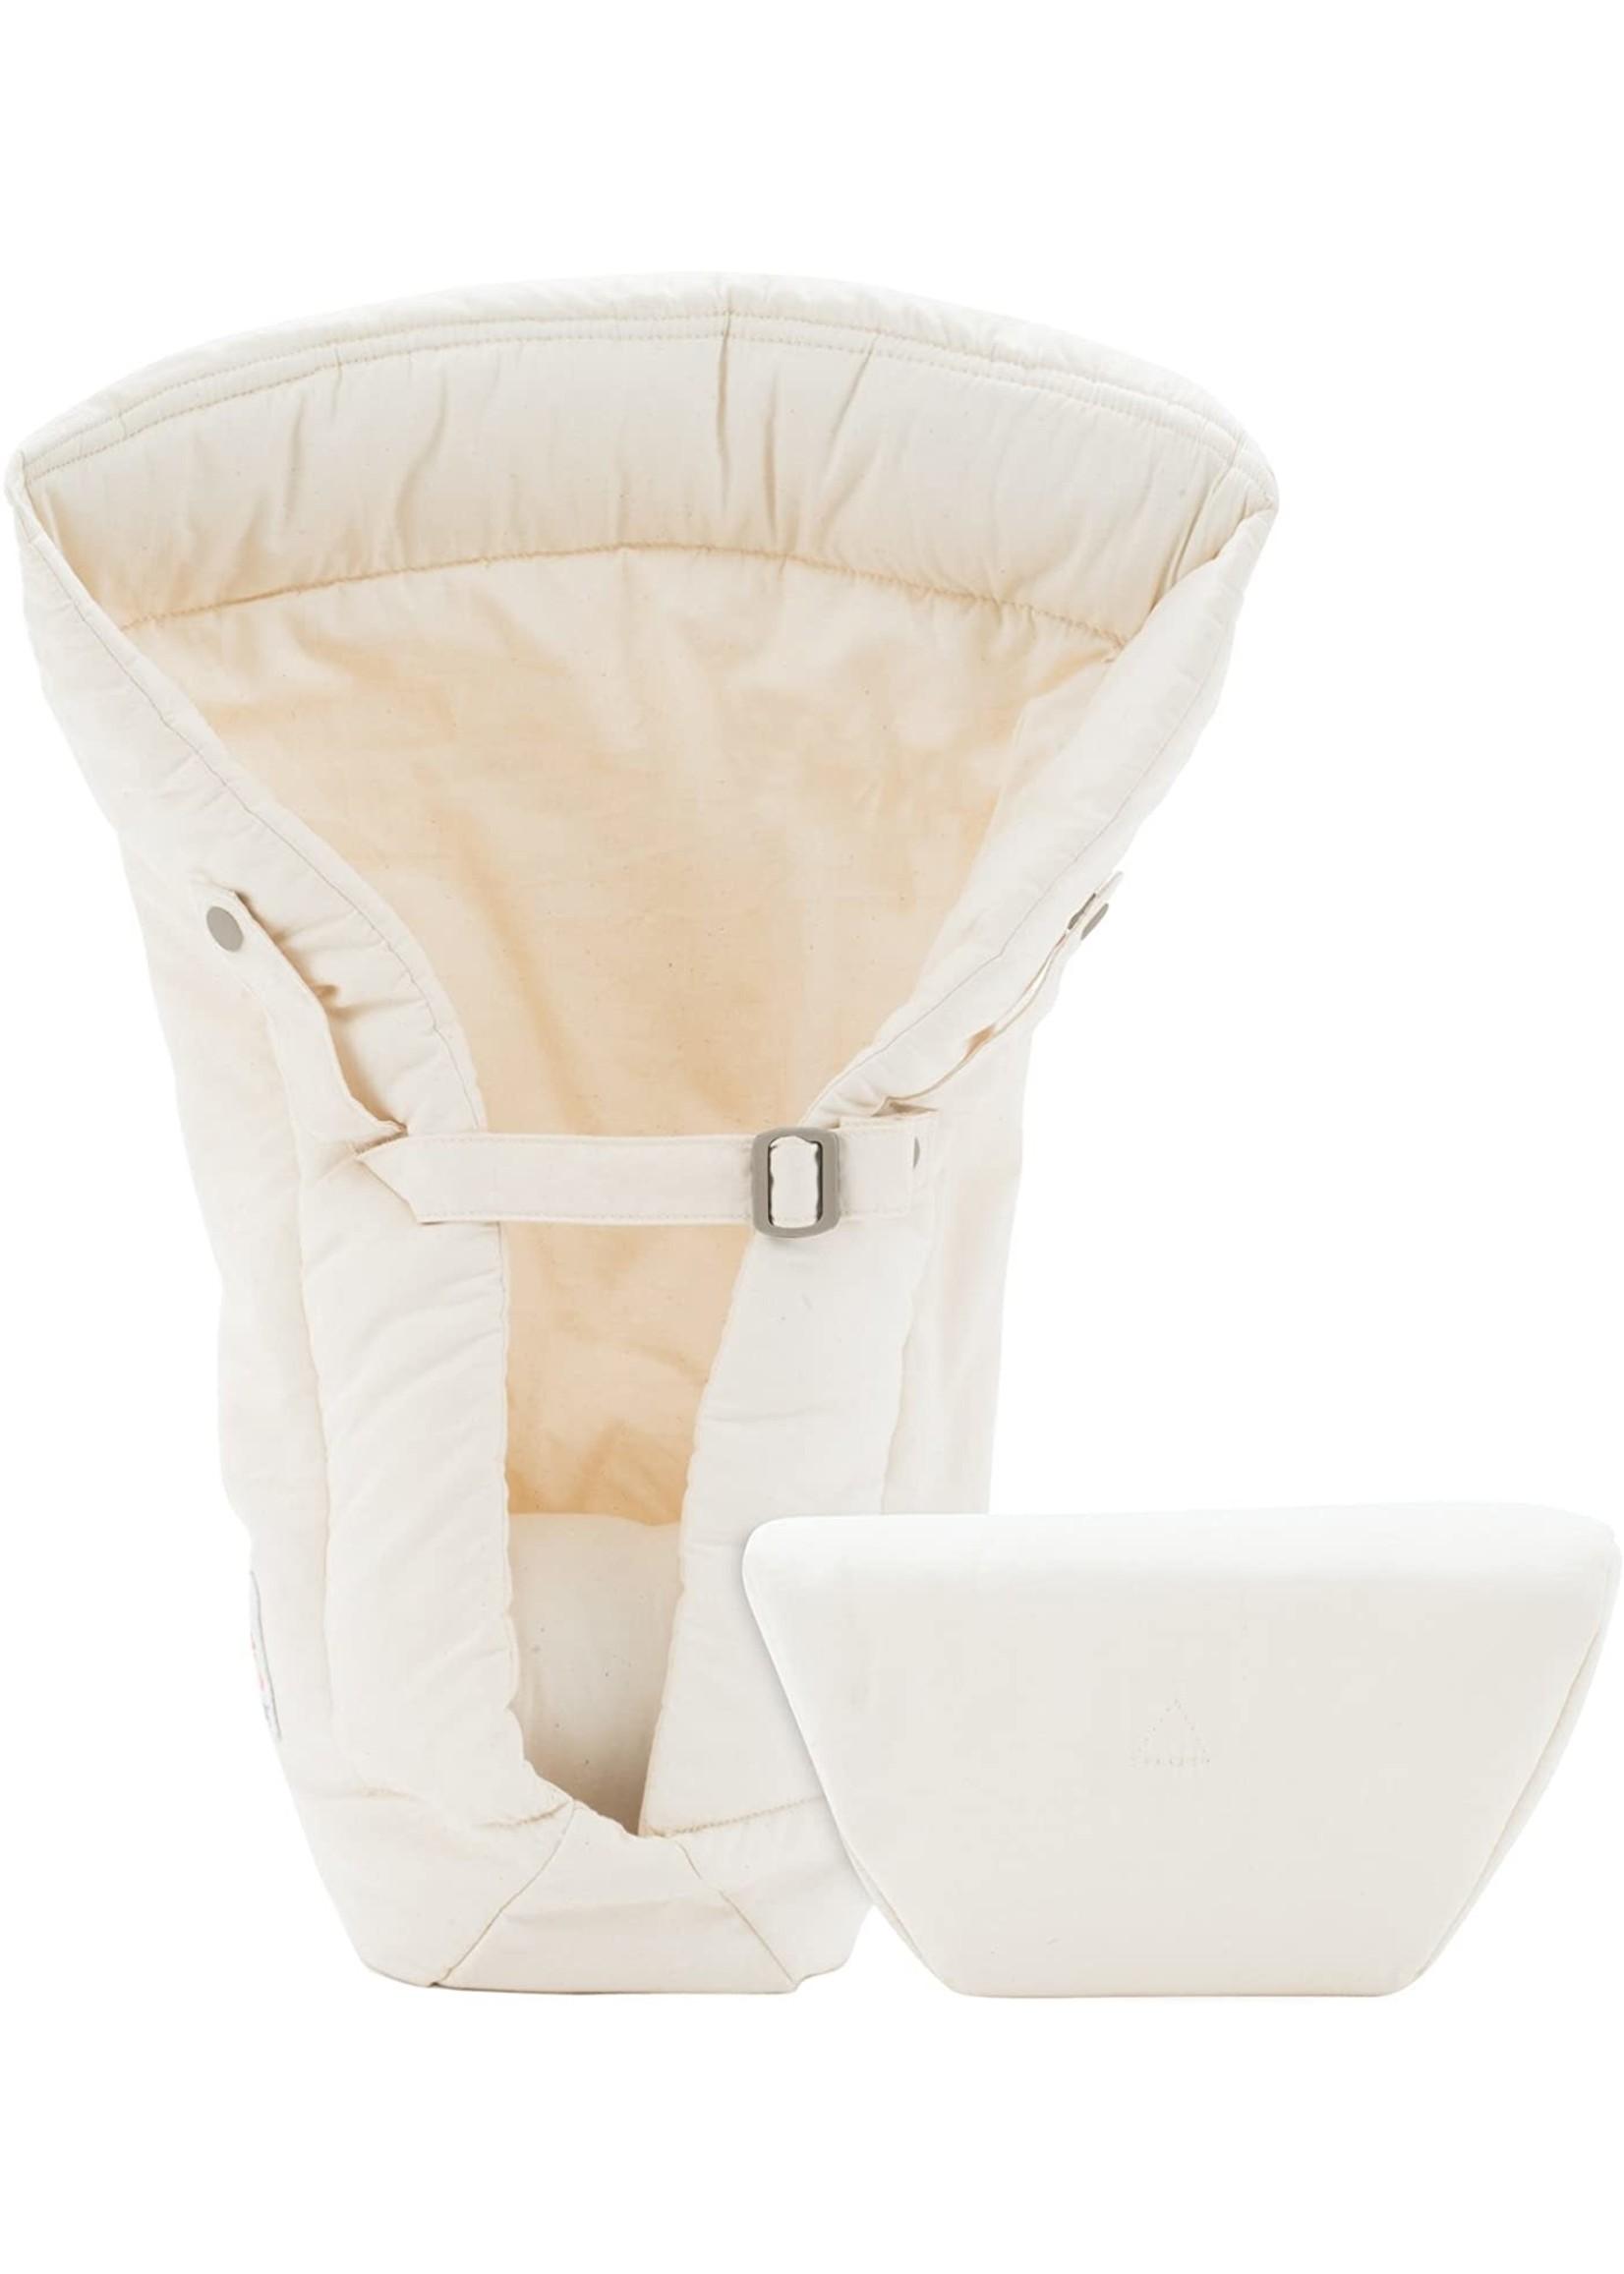 ergobaby Ergobaby Baby Carrier Organic Cotton Infant Insert (Natural)